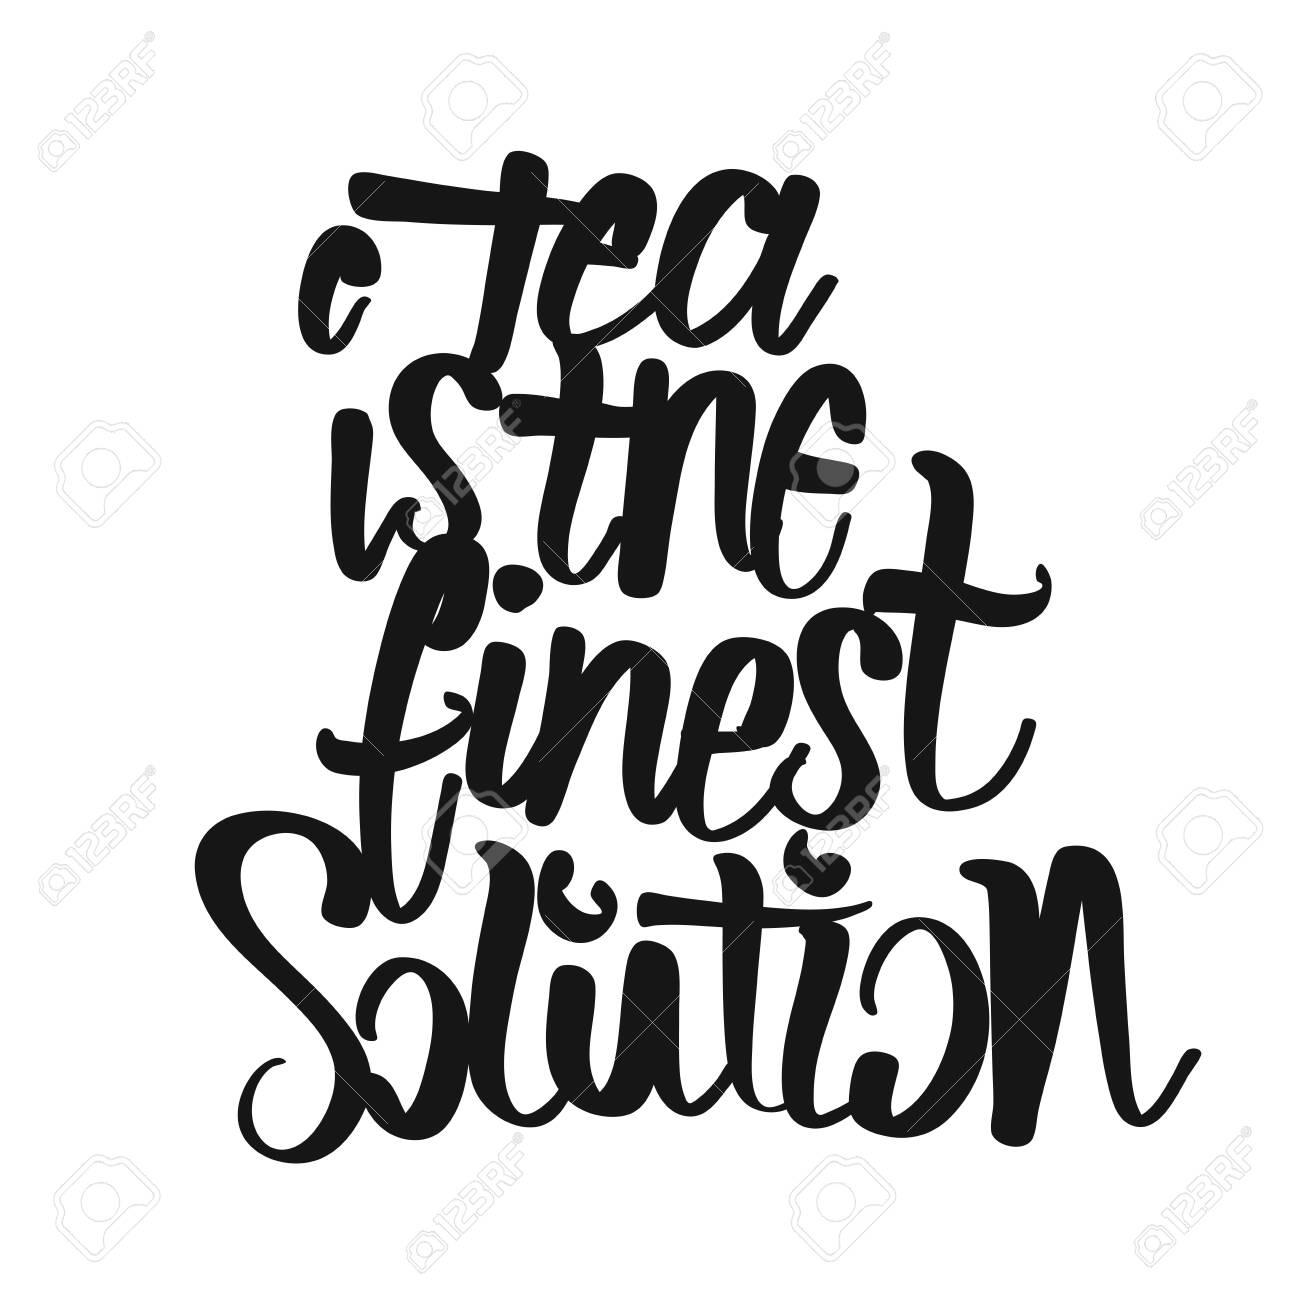 photograph regarding Printable Kitchen Art known as Tea Is The Fines Alternative handwritten lettering. Printable Kitchen area..